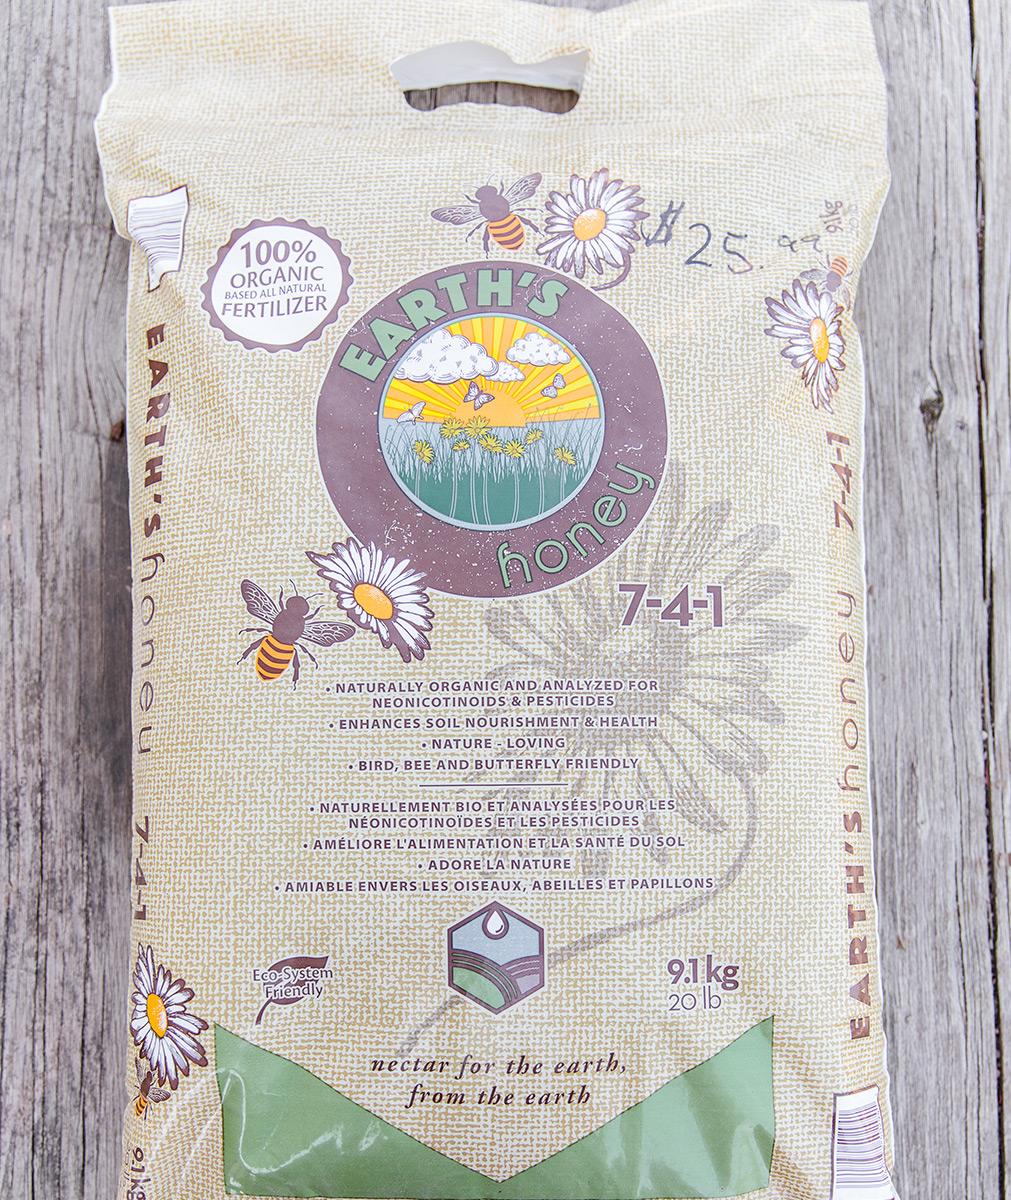 Sod, Seed & Fertilizer – Trails End Landscape Supplies